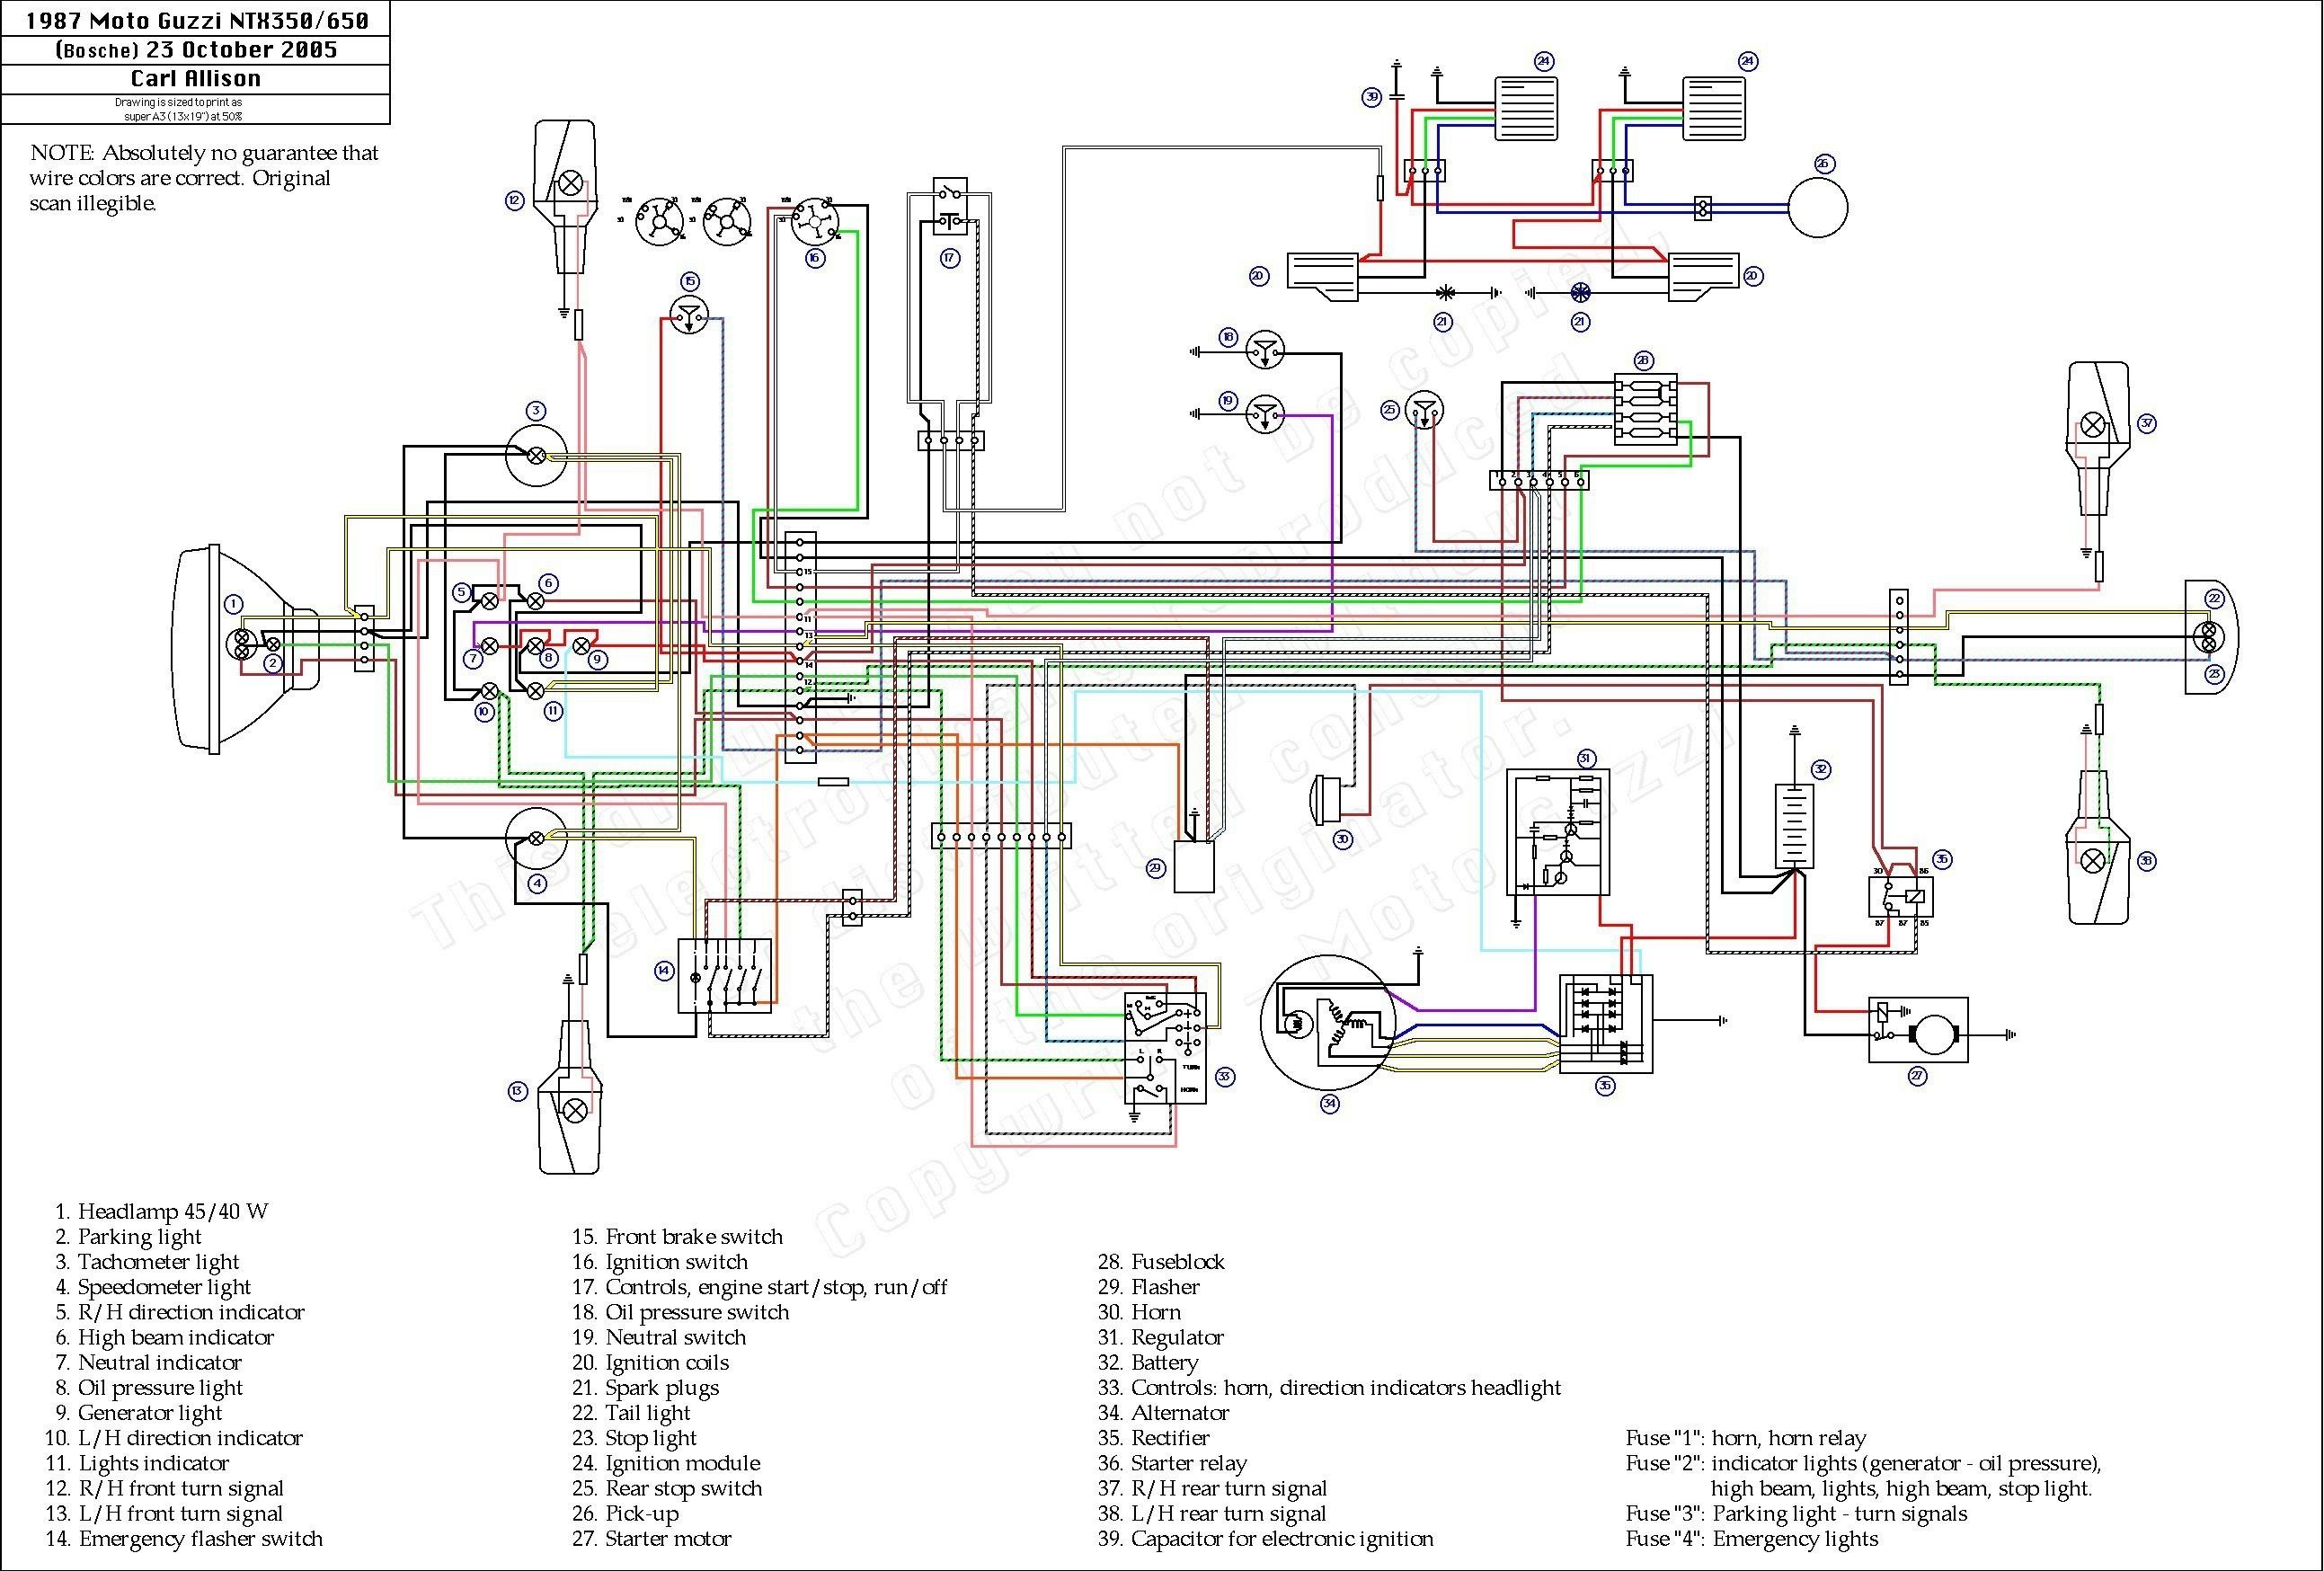 Diagram Kazuma Falcon 110 Wiring Diagram Full Version Hd Quality Wiring Diagram Jerrysautowiring Atouts Jardin Fr